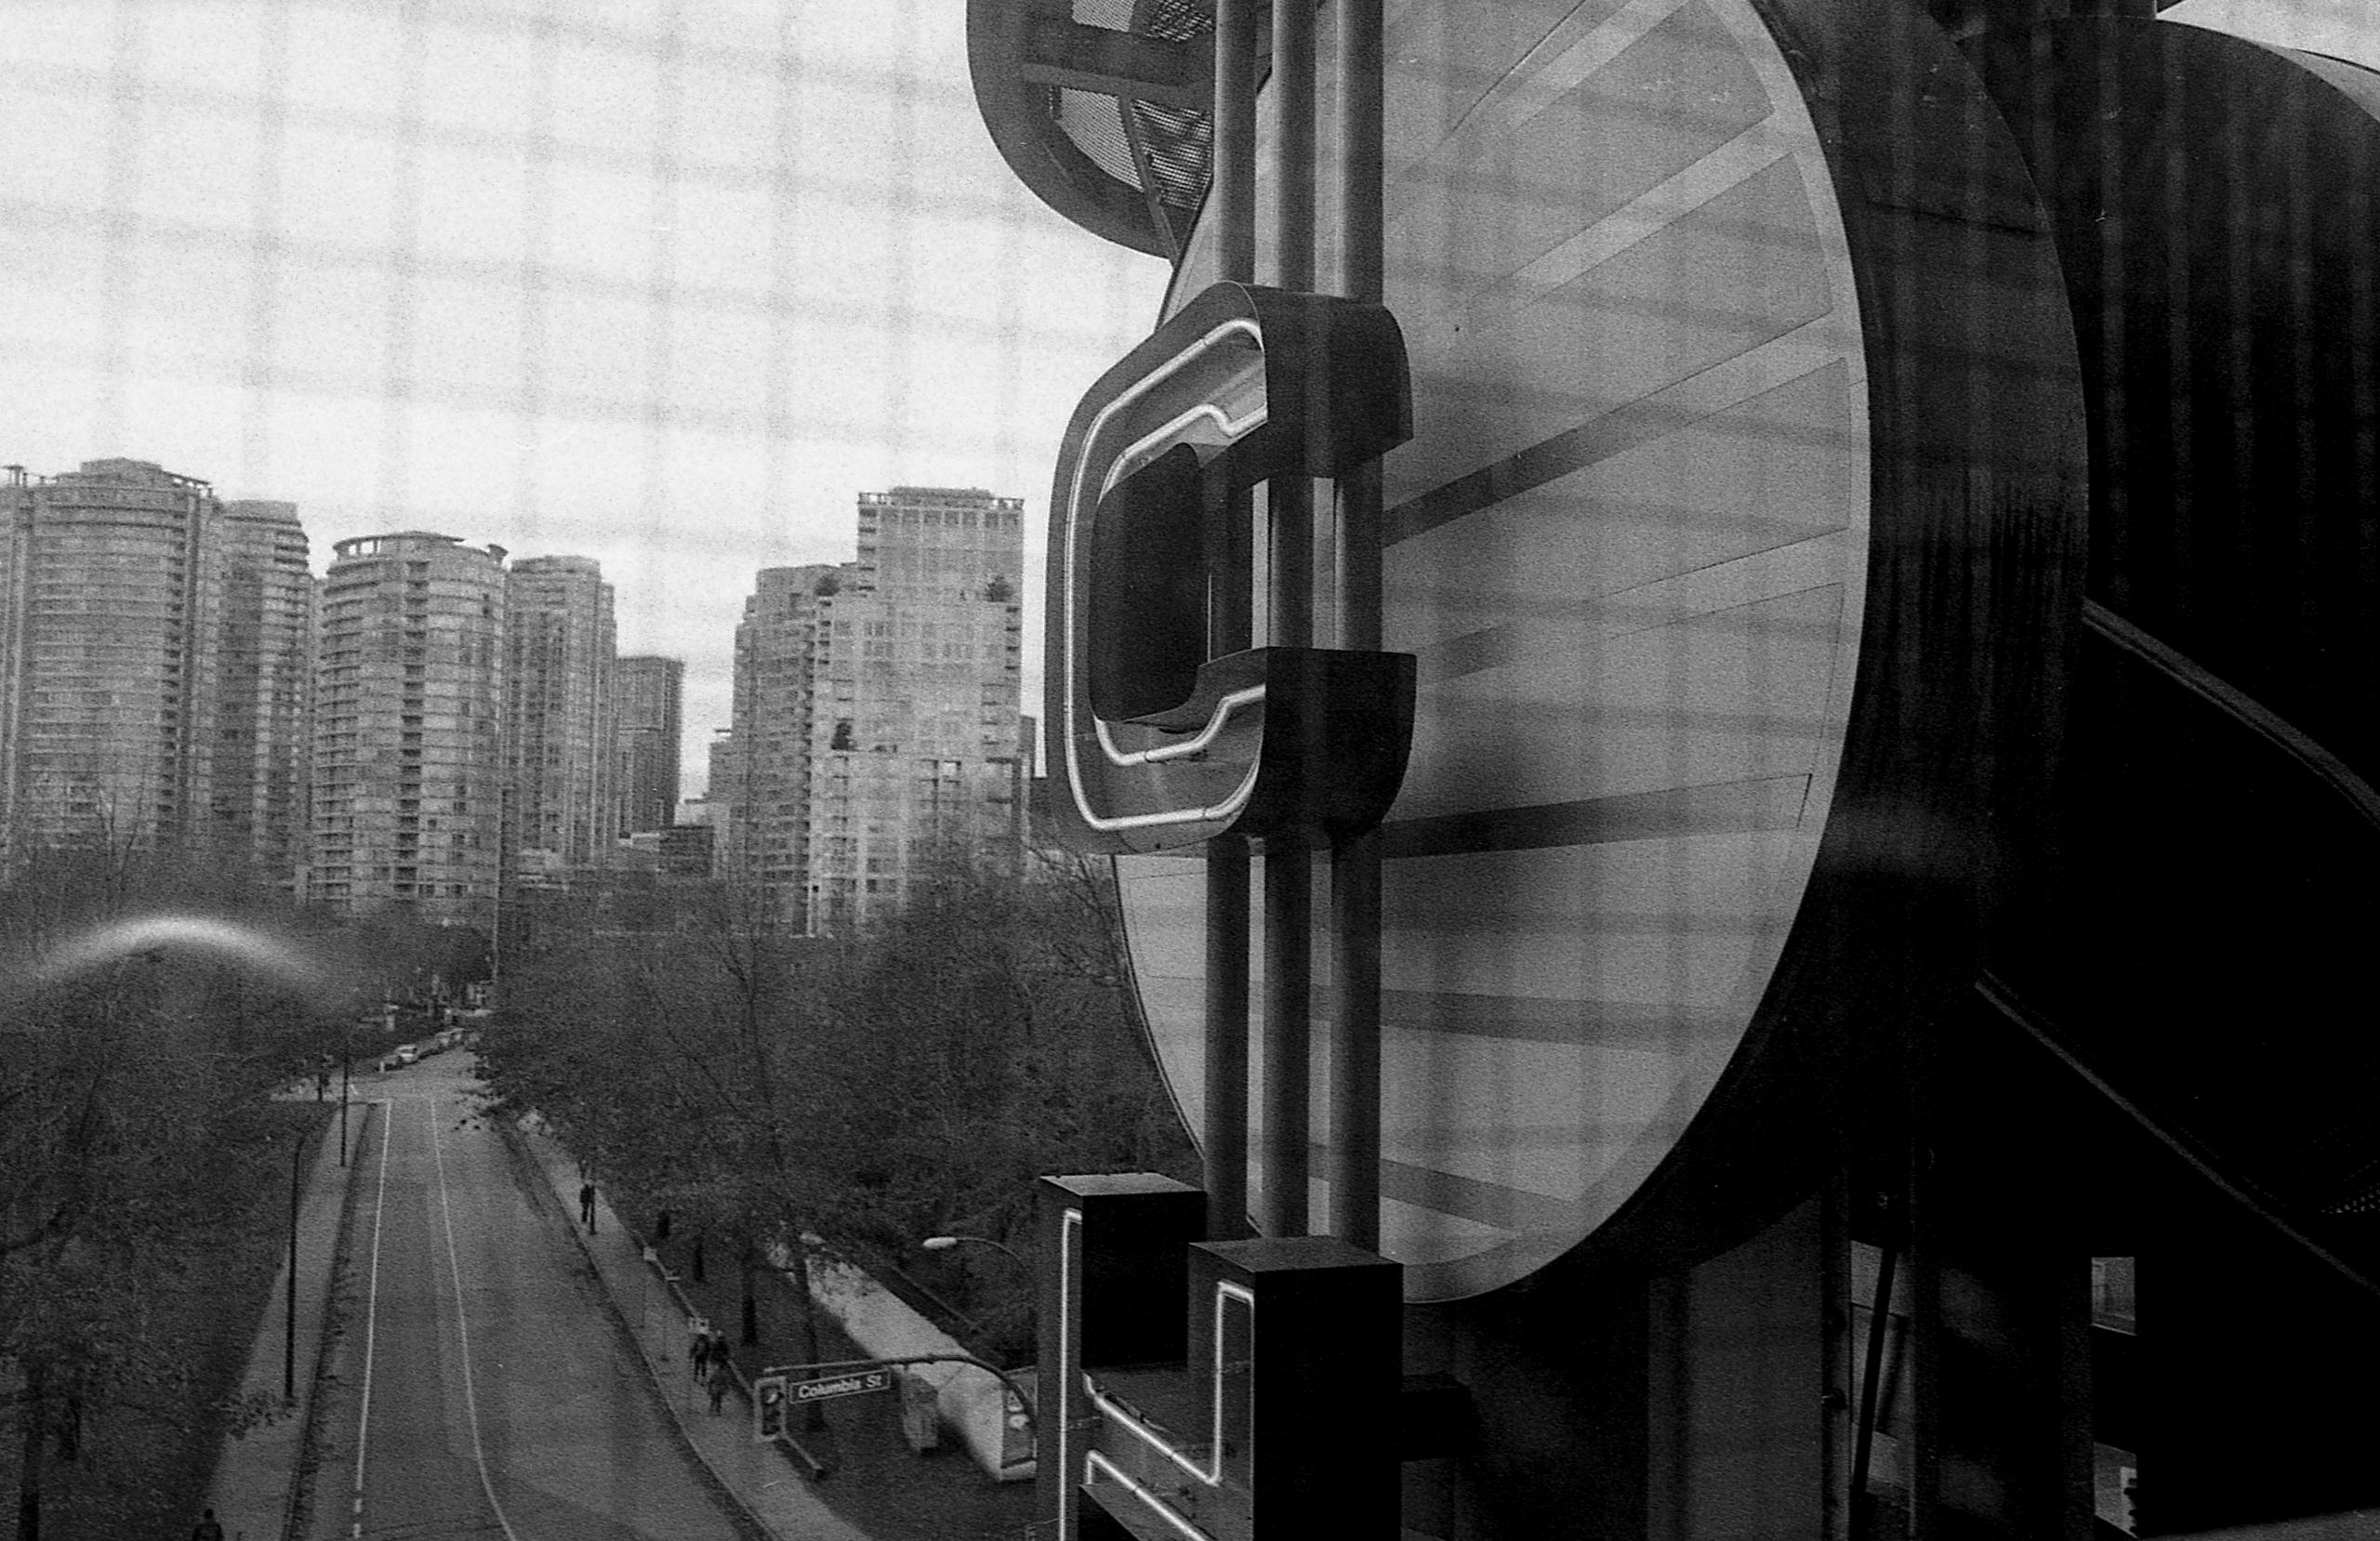 Chinatown - monochrome, blackandwhitephoto - kch | ello